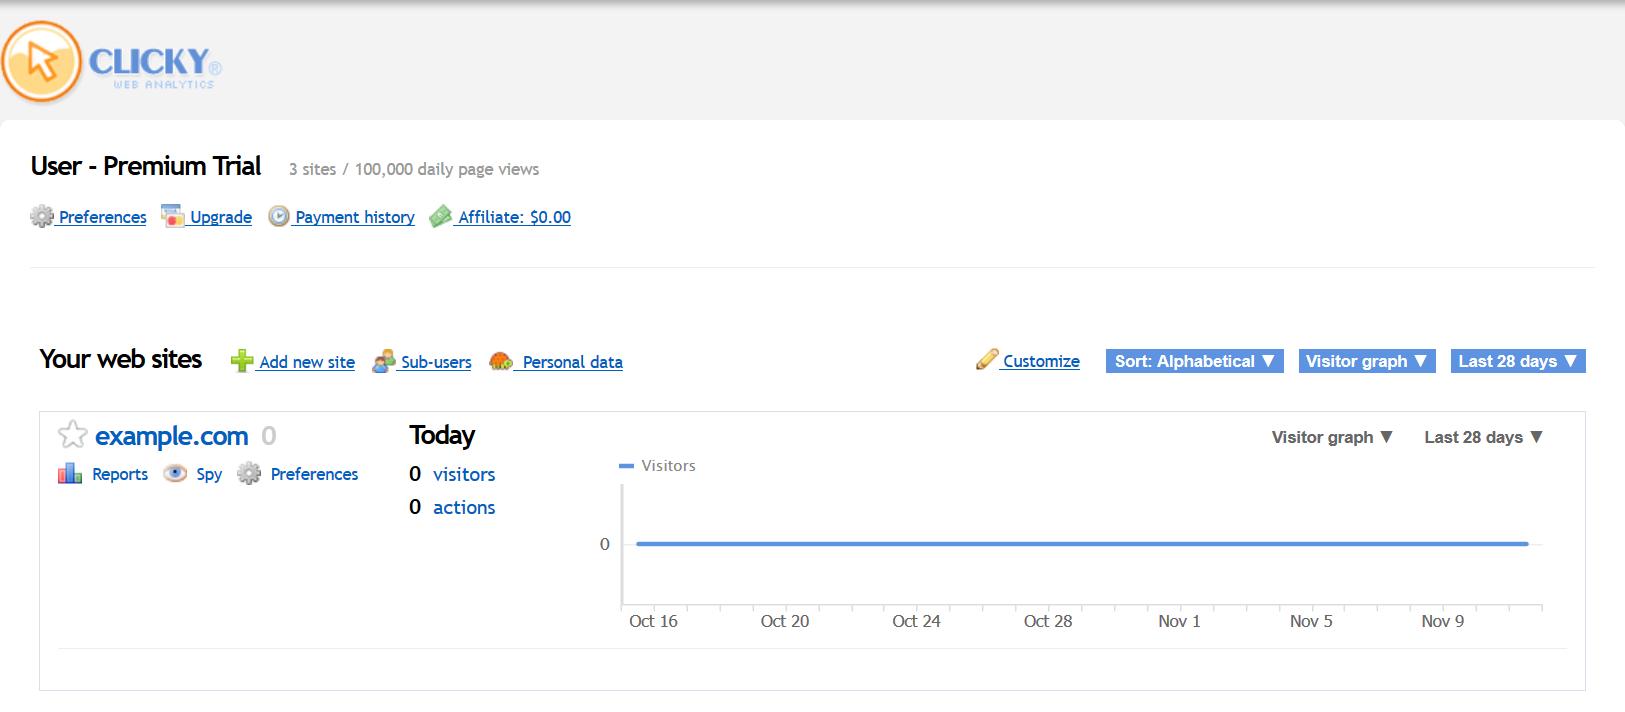 clicky analytics websites overview